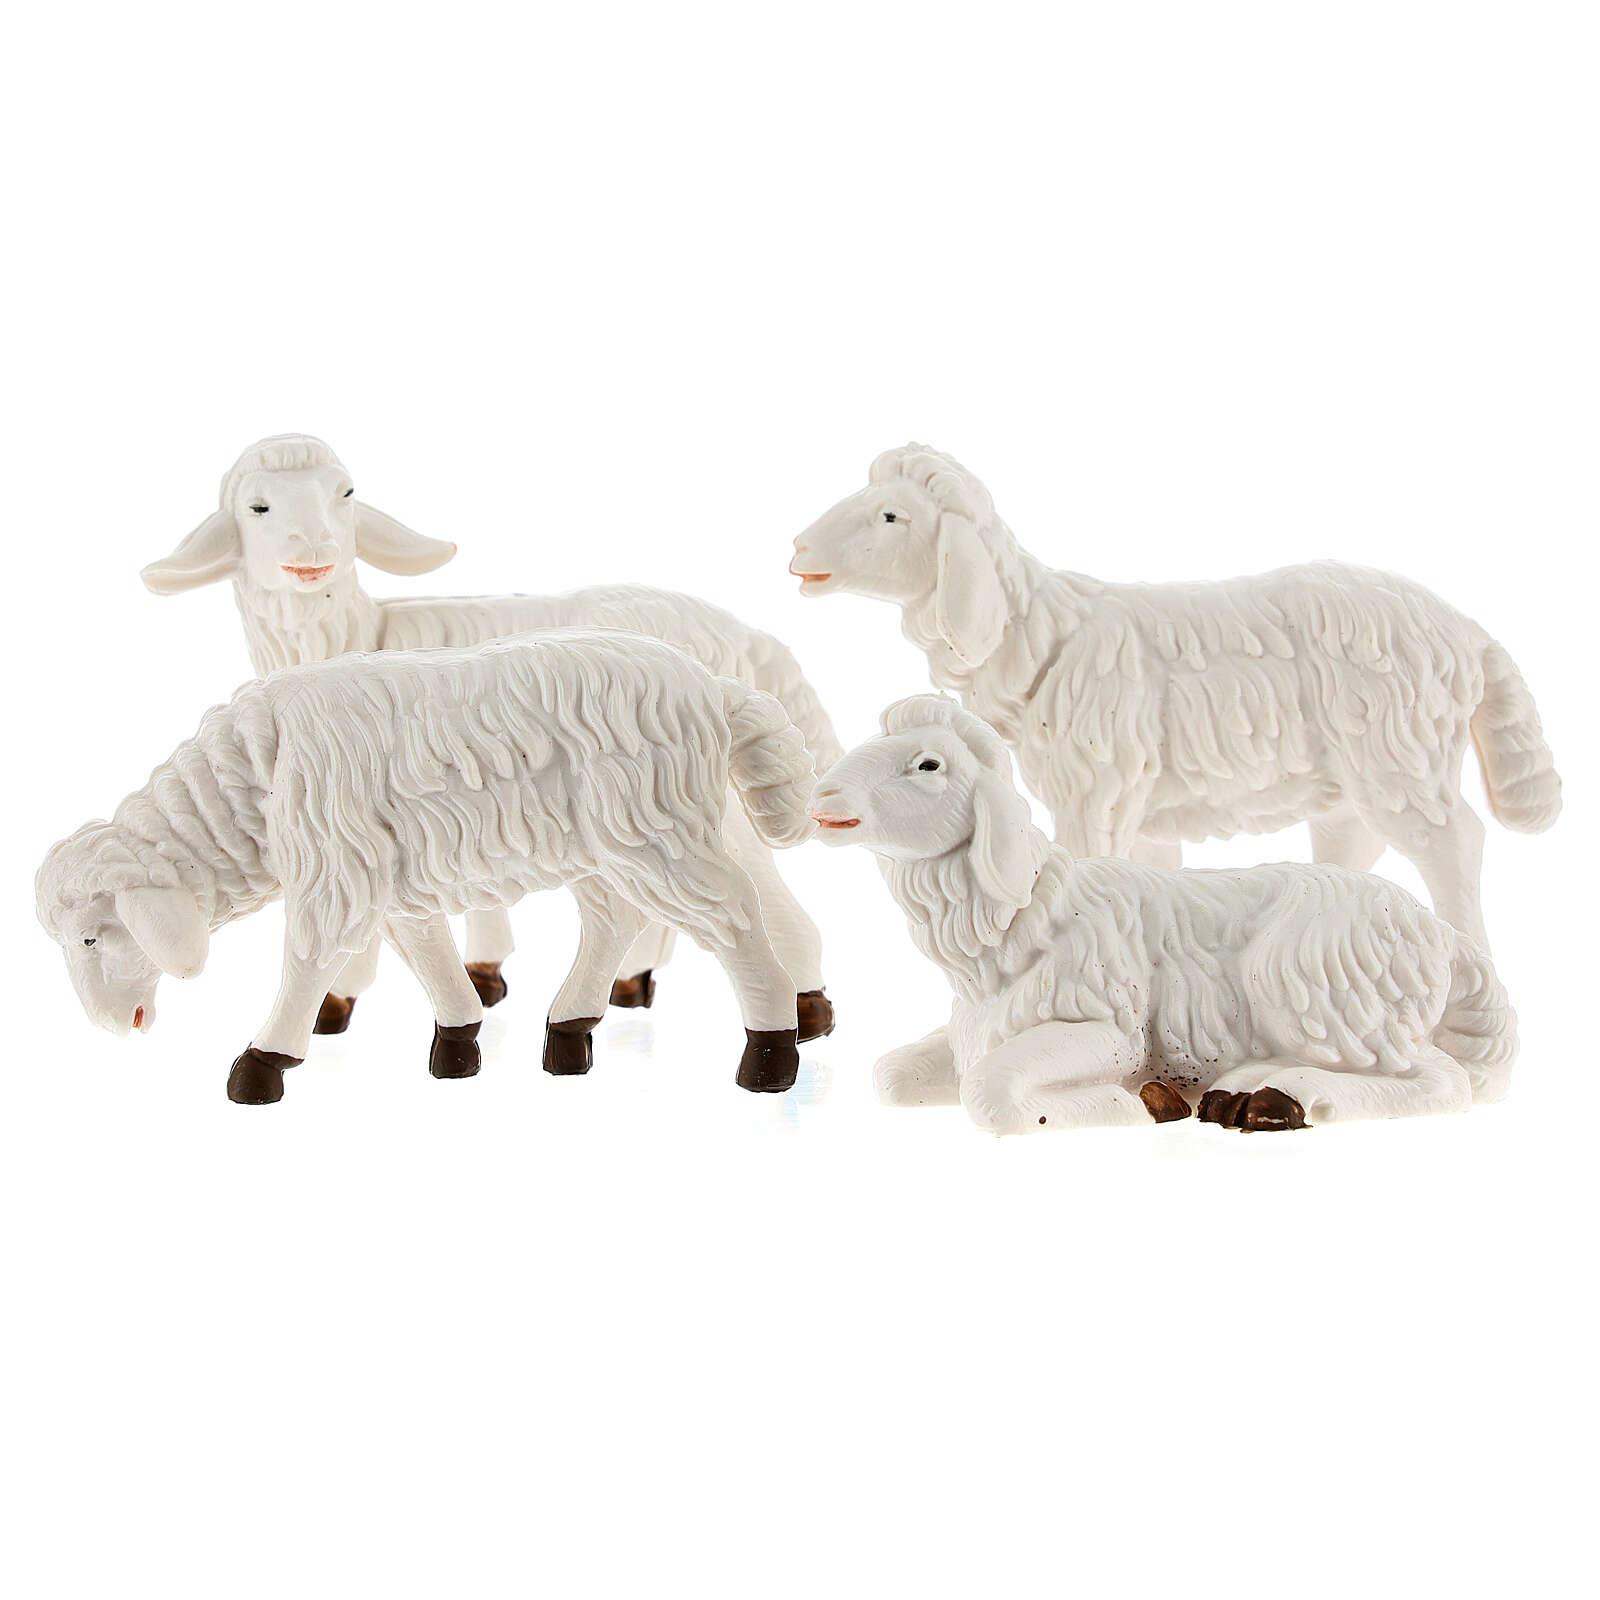 Pecore presepe plastica bianca 4 pz. presepe altezza media 12 cm 3